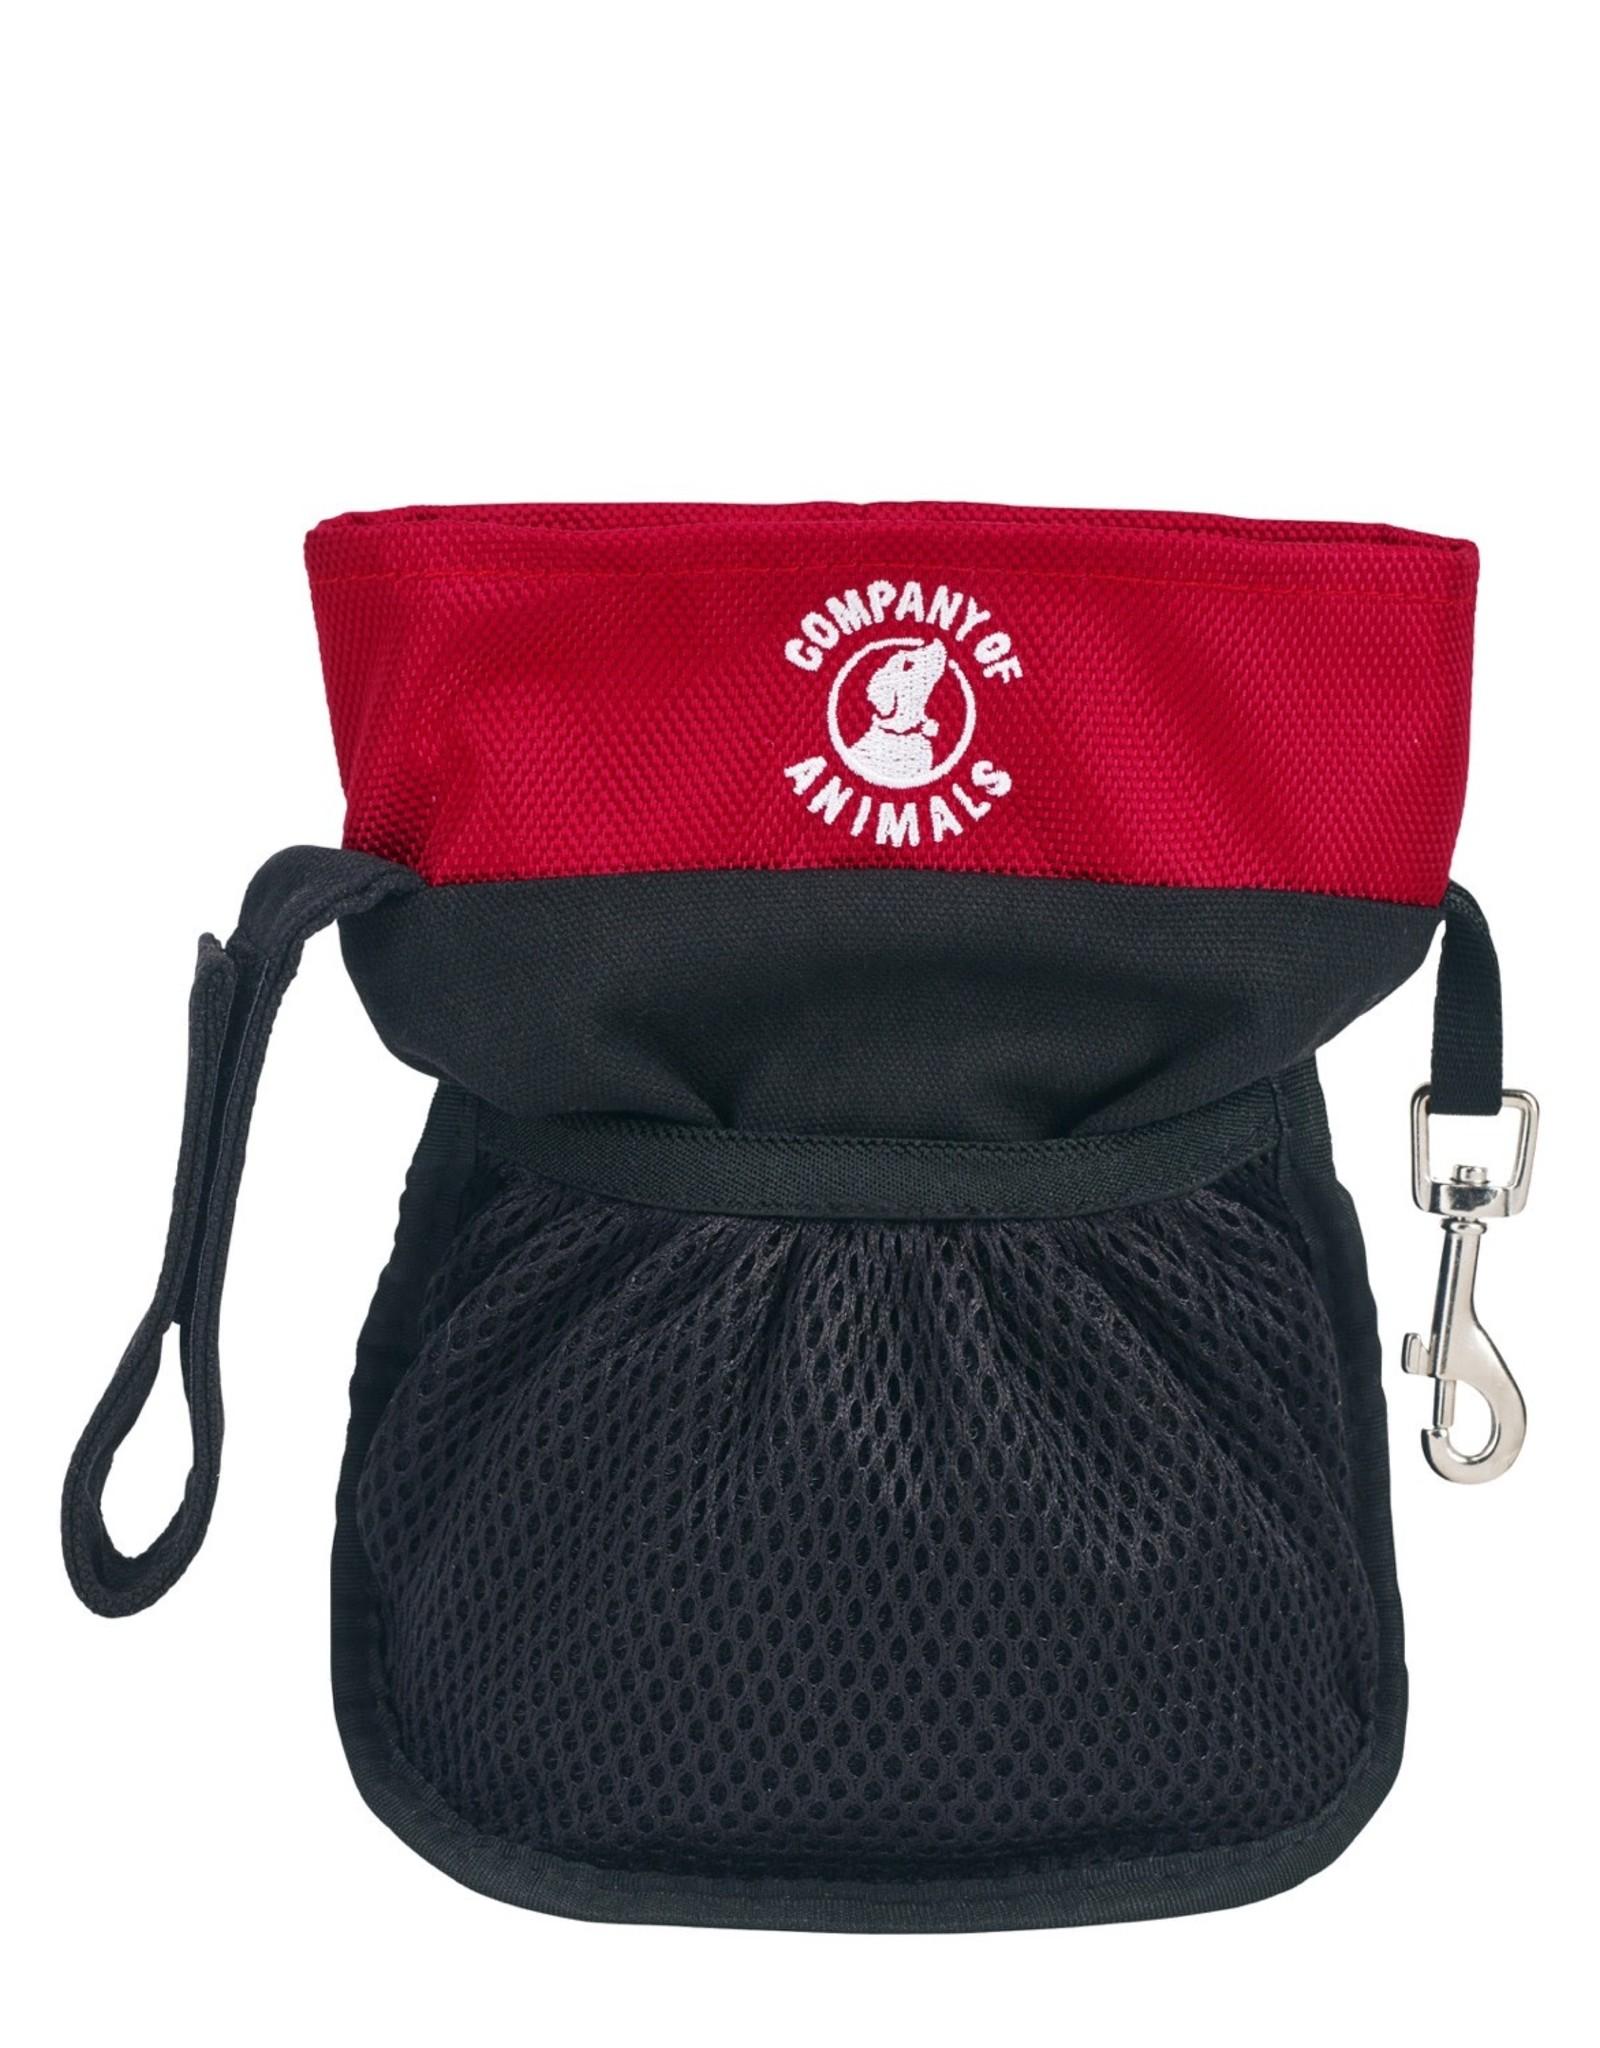 Company Of Animals Company of Animals Clix Pro Treat Bag-red